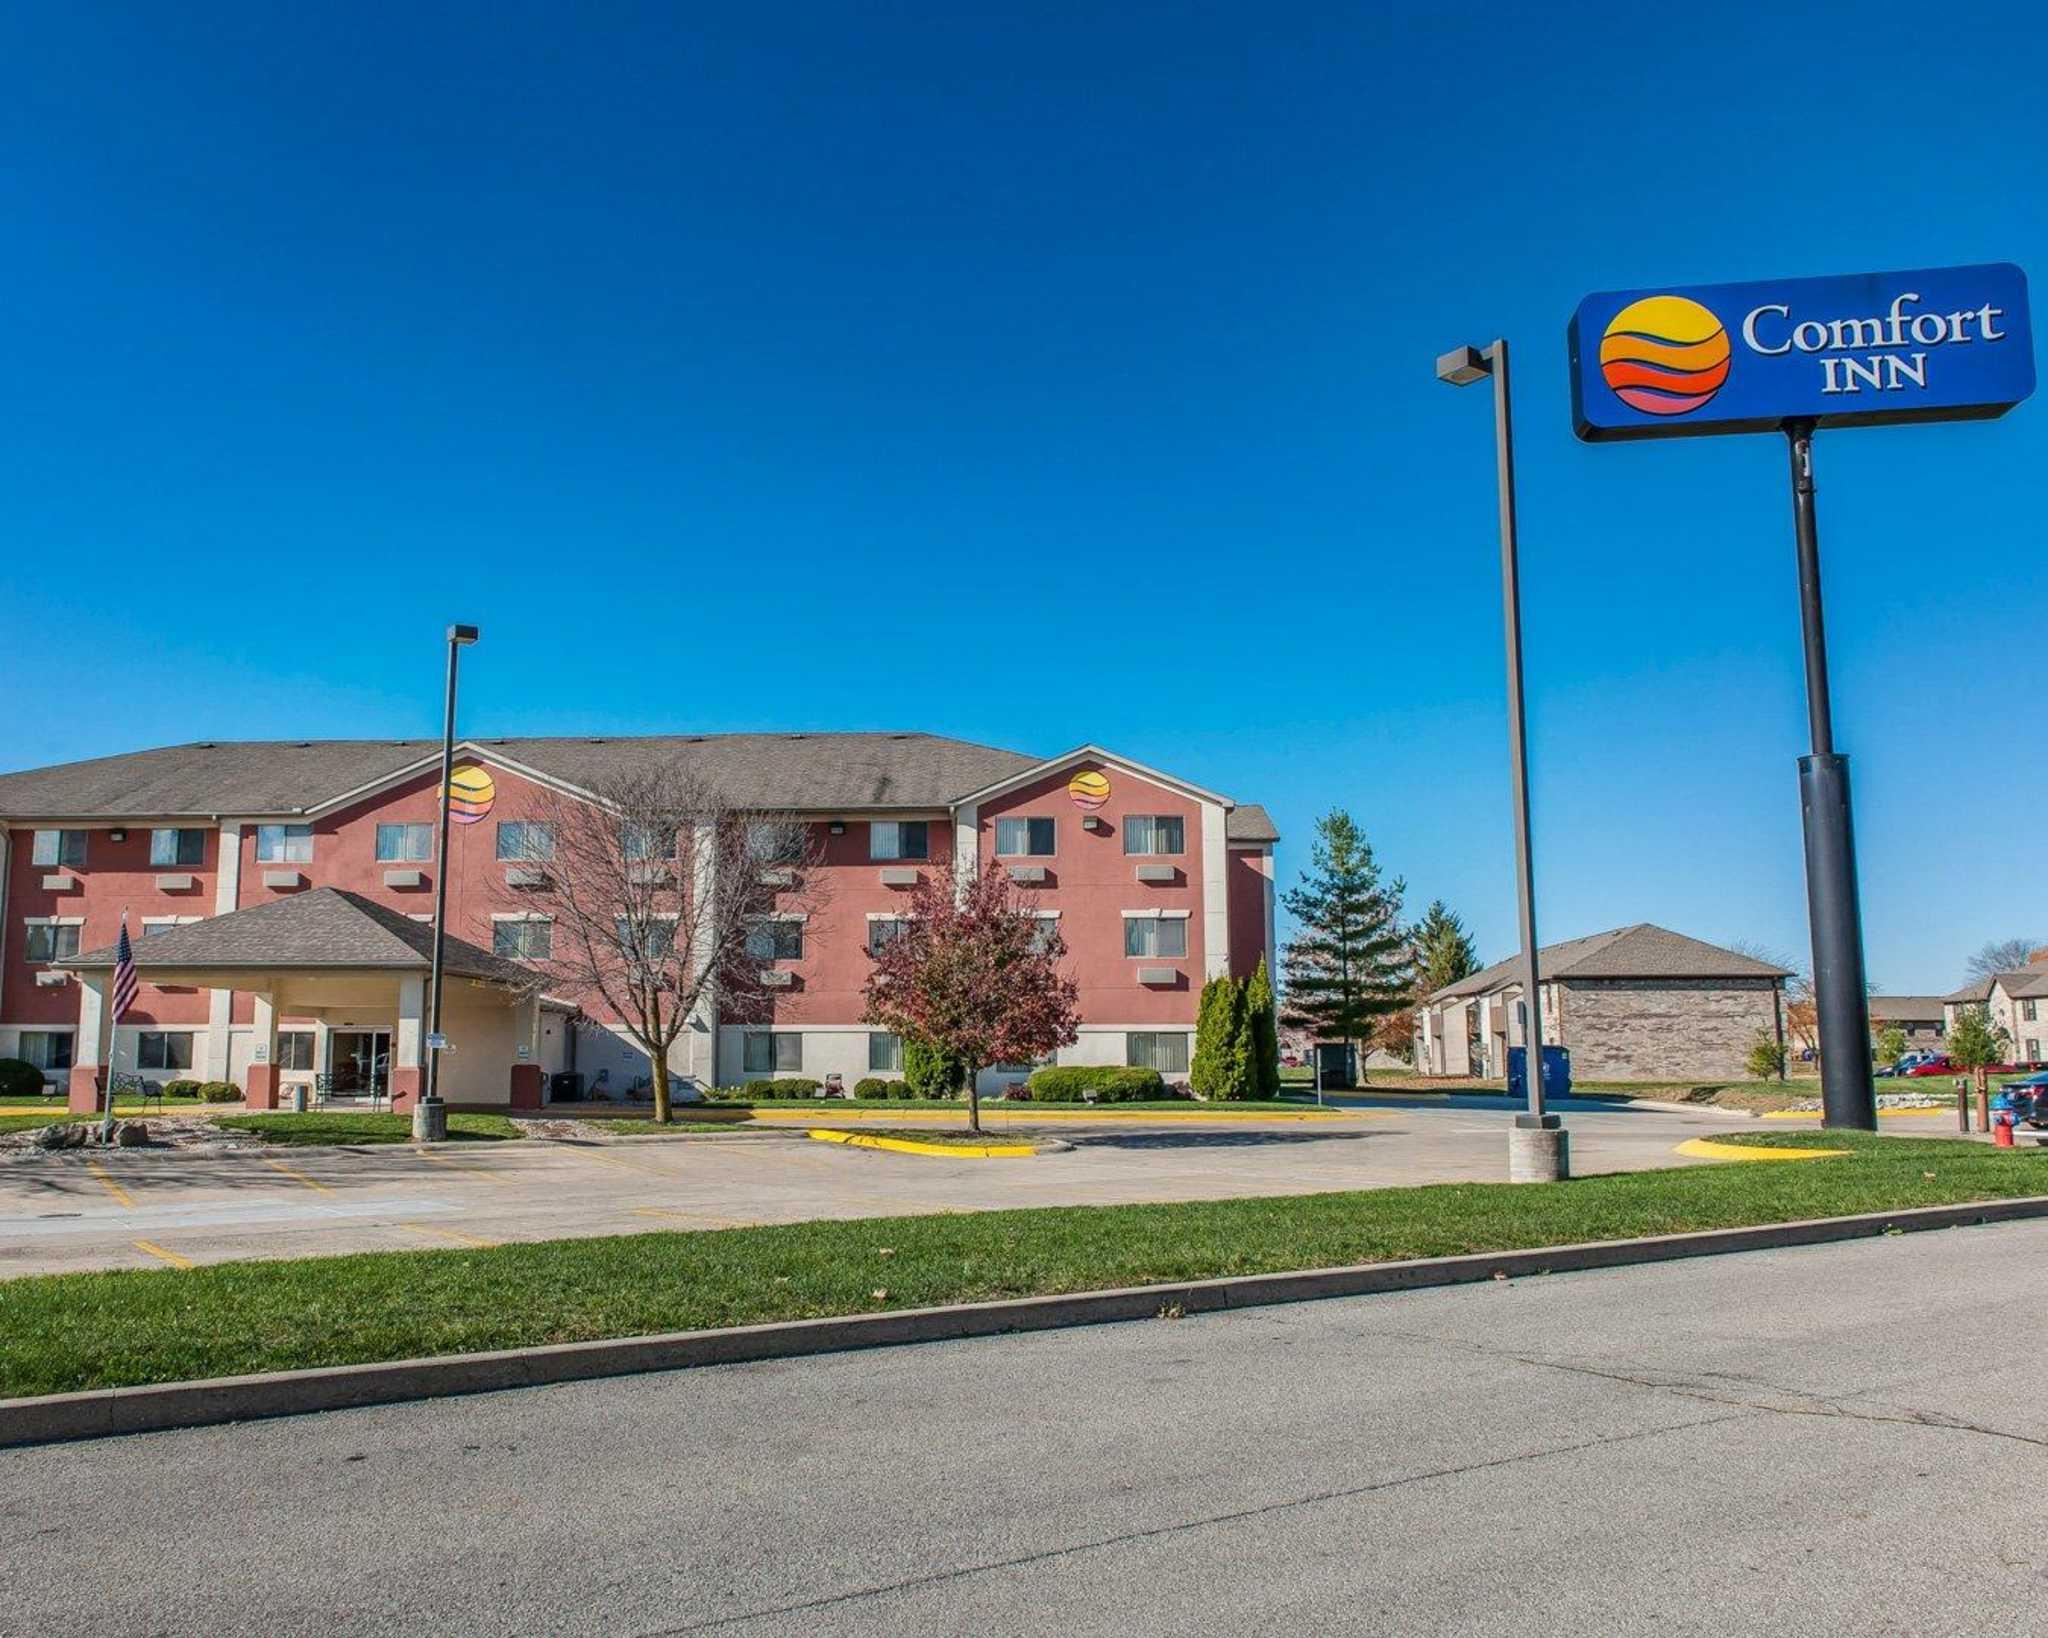 Comfort Inn Shelbyville North image 23